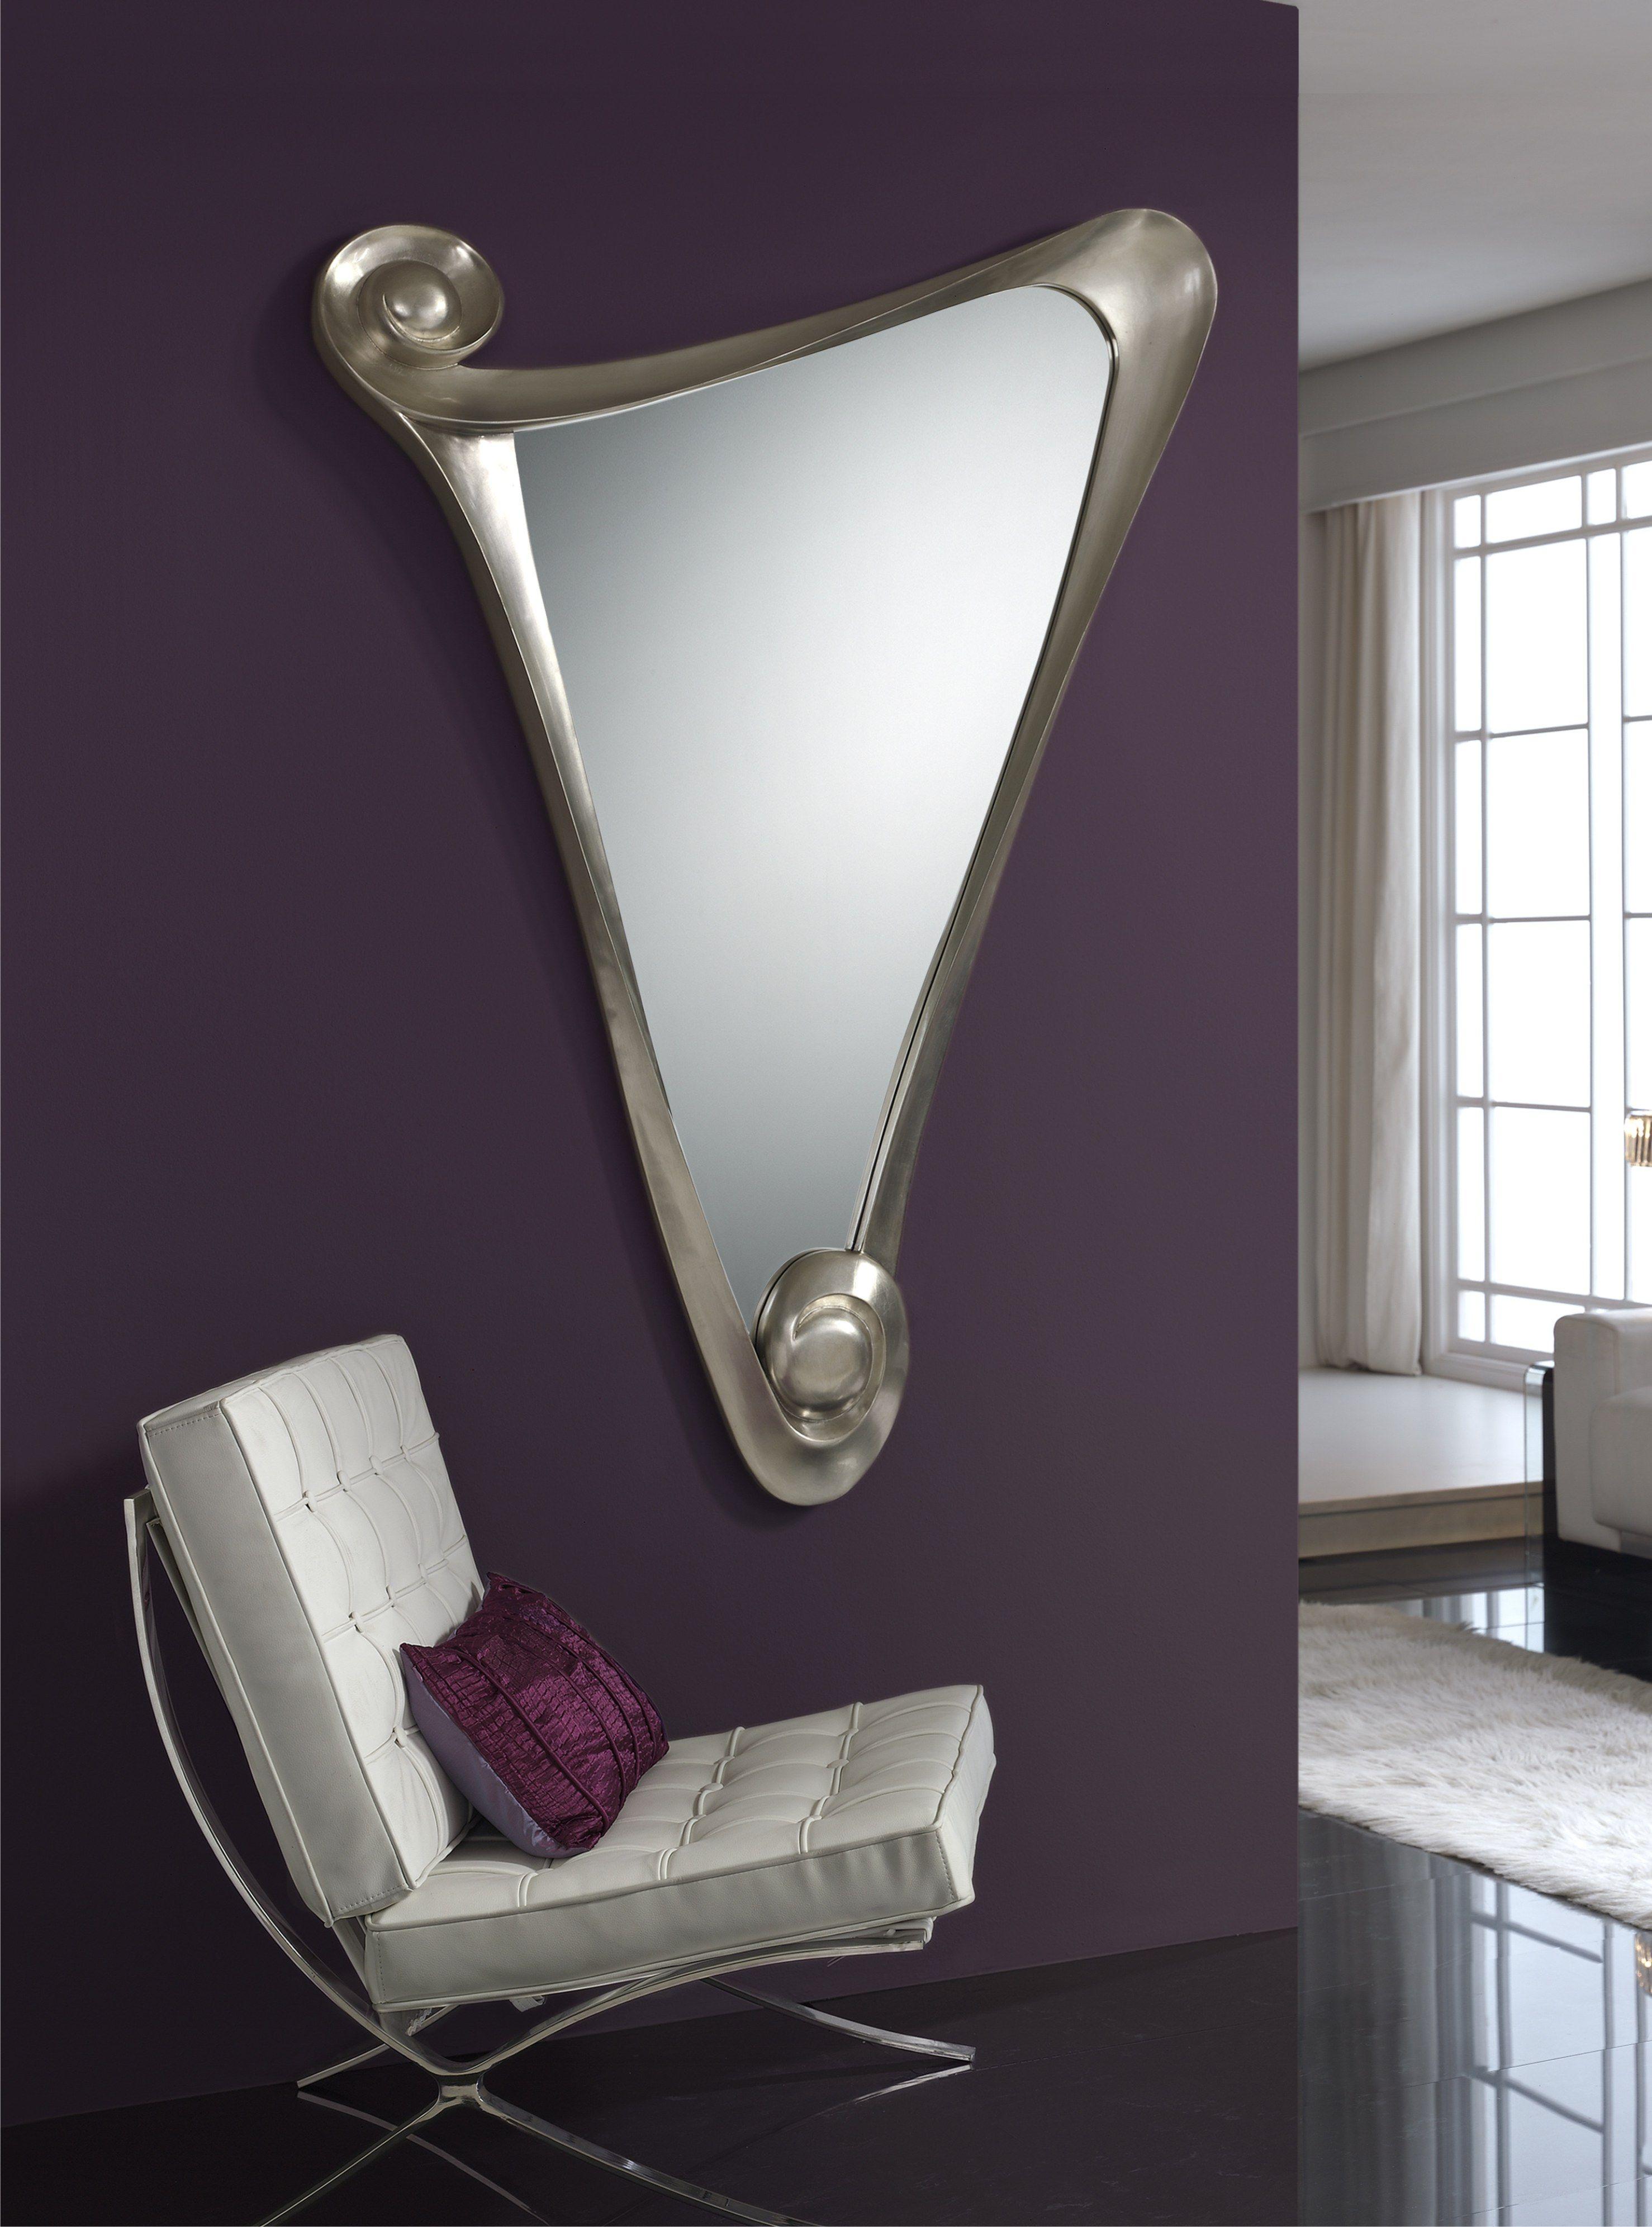 Espejo gala schuller espejos espejos espejos - Espejos modernos ...